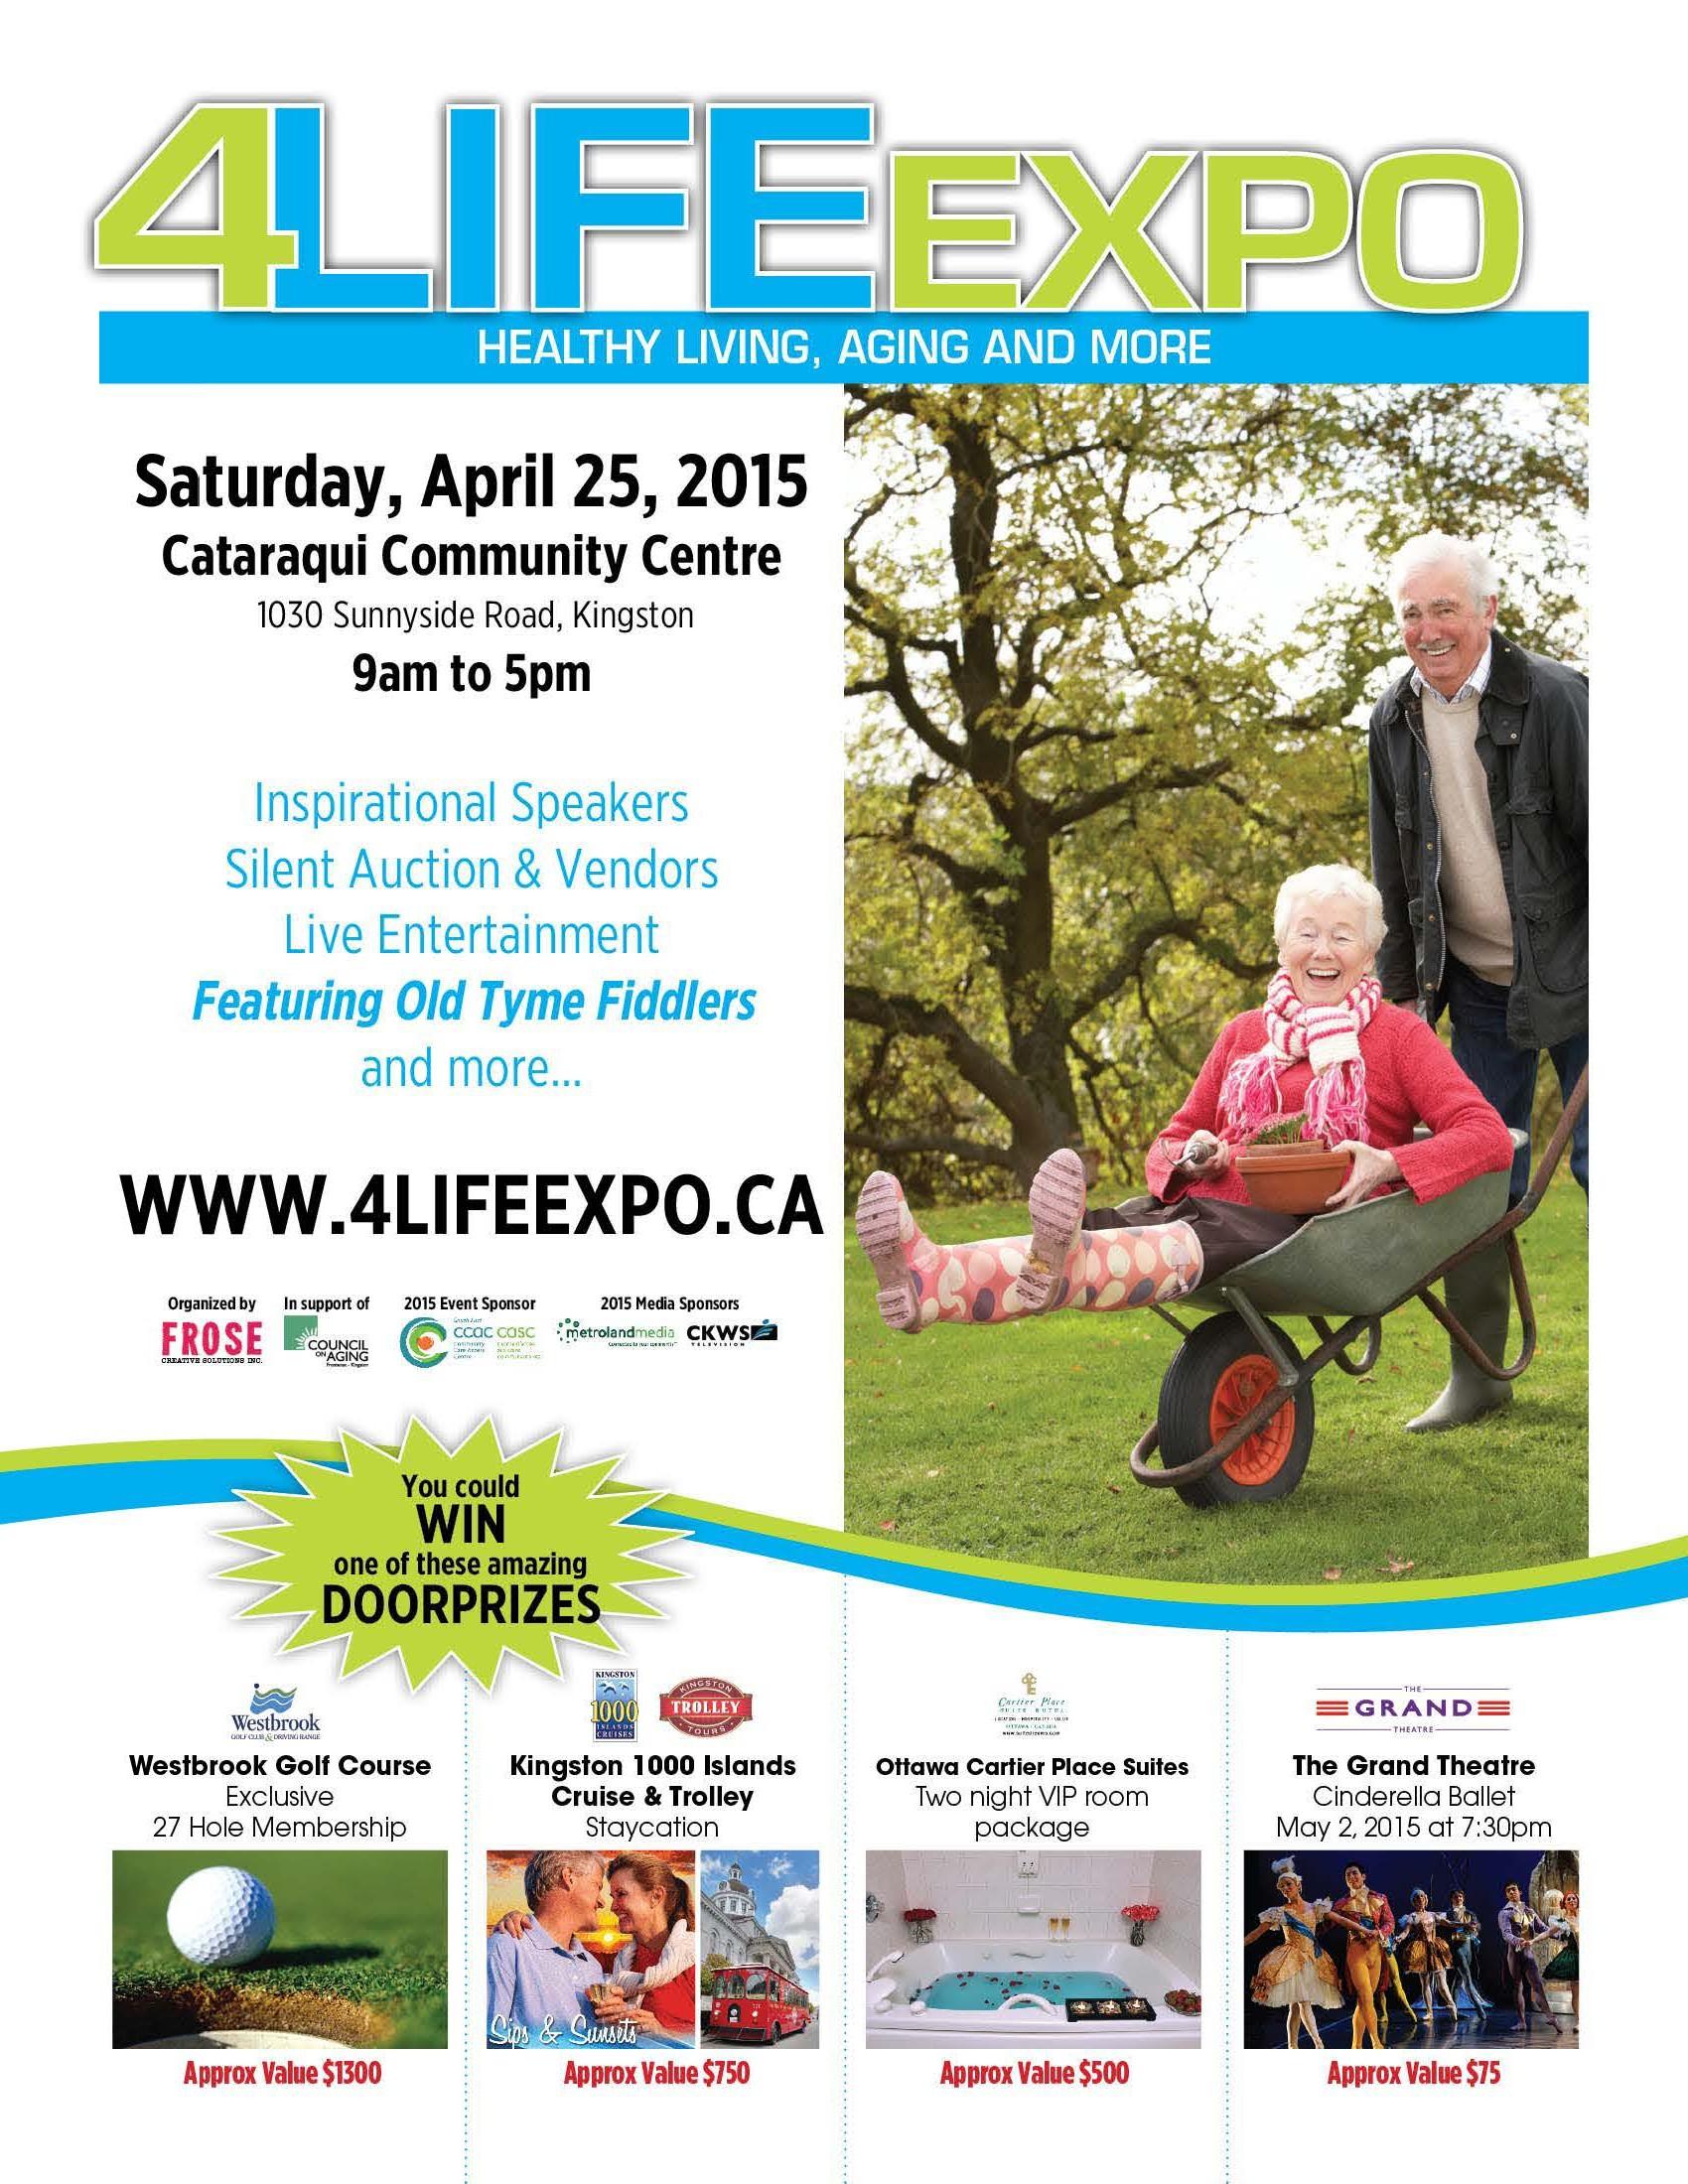 4 Life Expo in Kingston April 25th, 2015